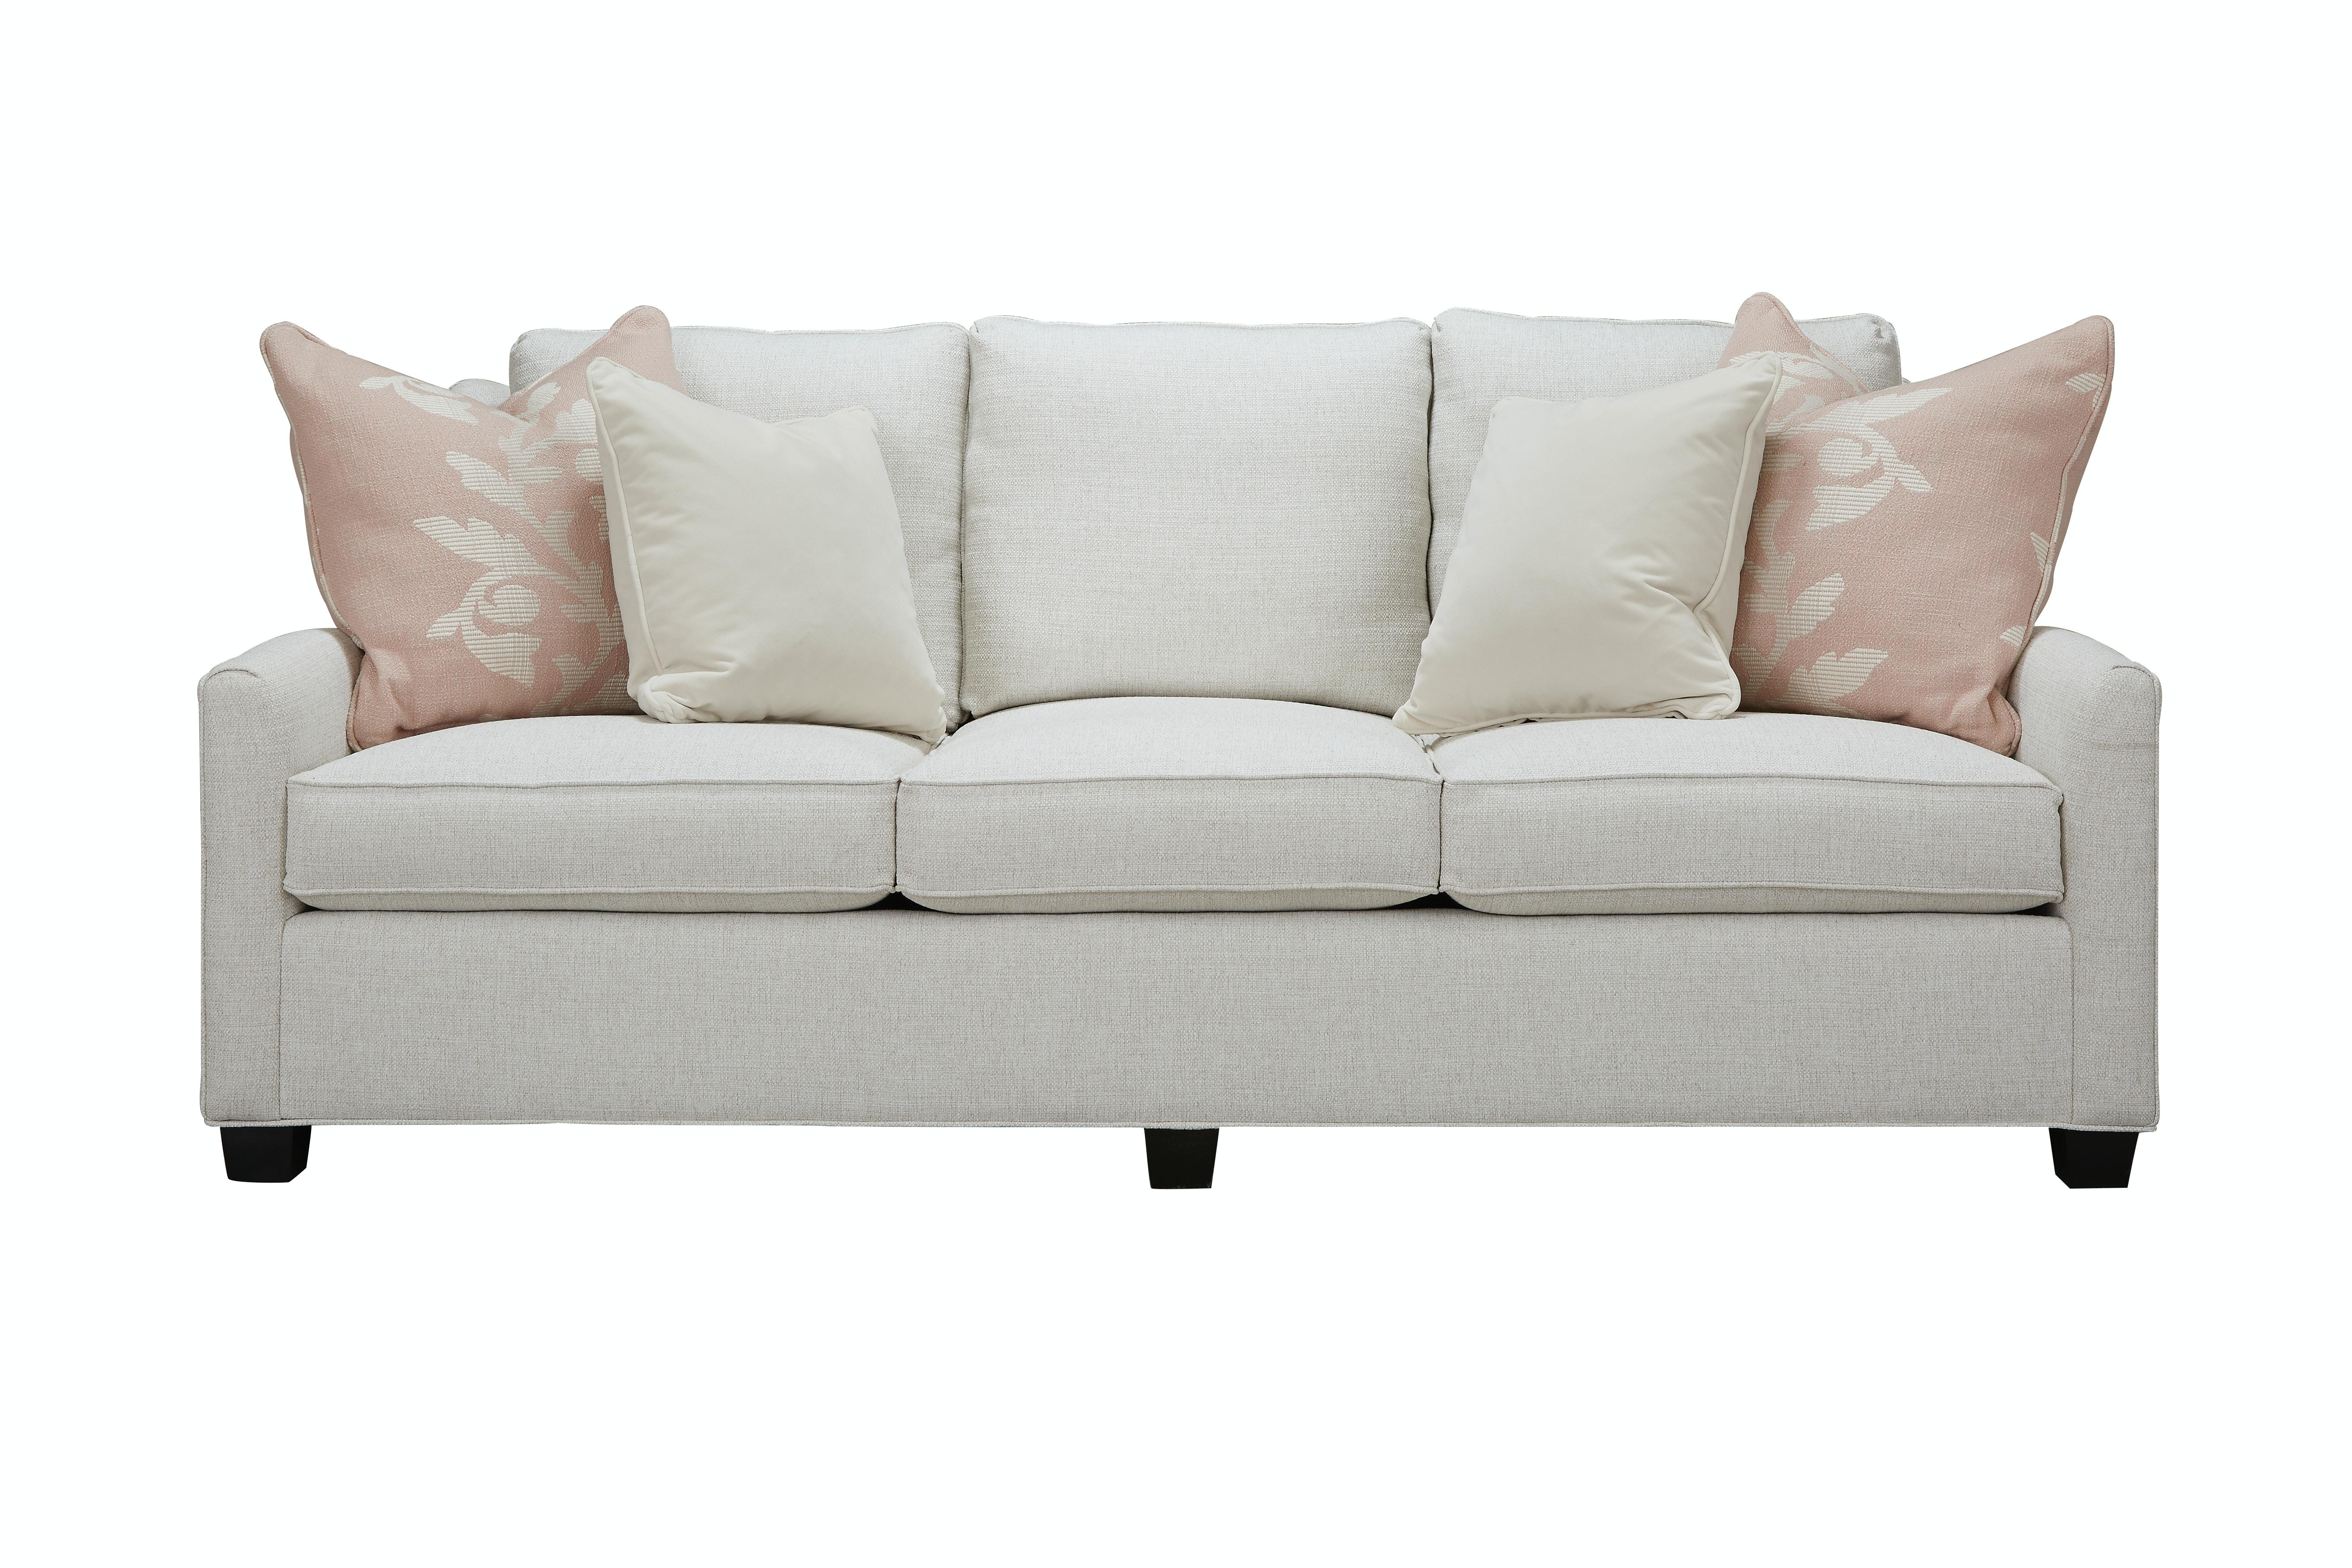 Attirant Southern Furniture LaRue 7ft Sofa   3 Over 3 23851